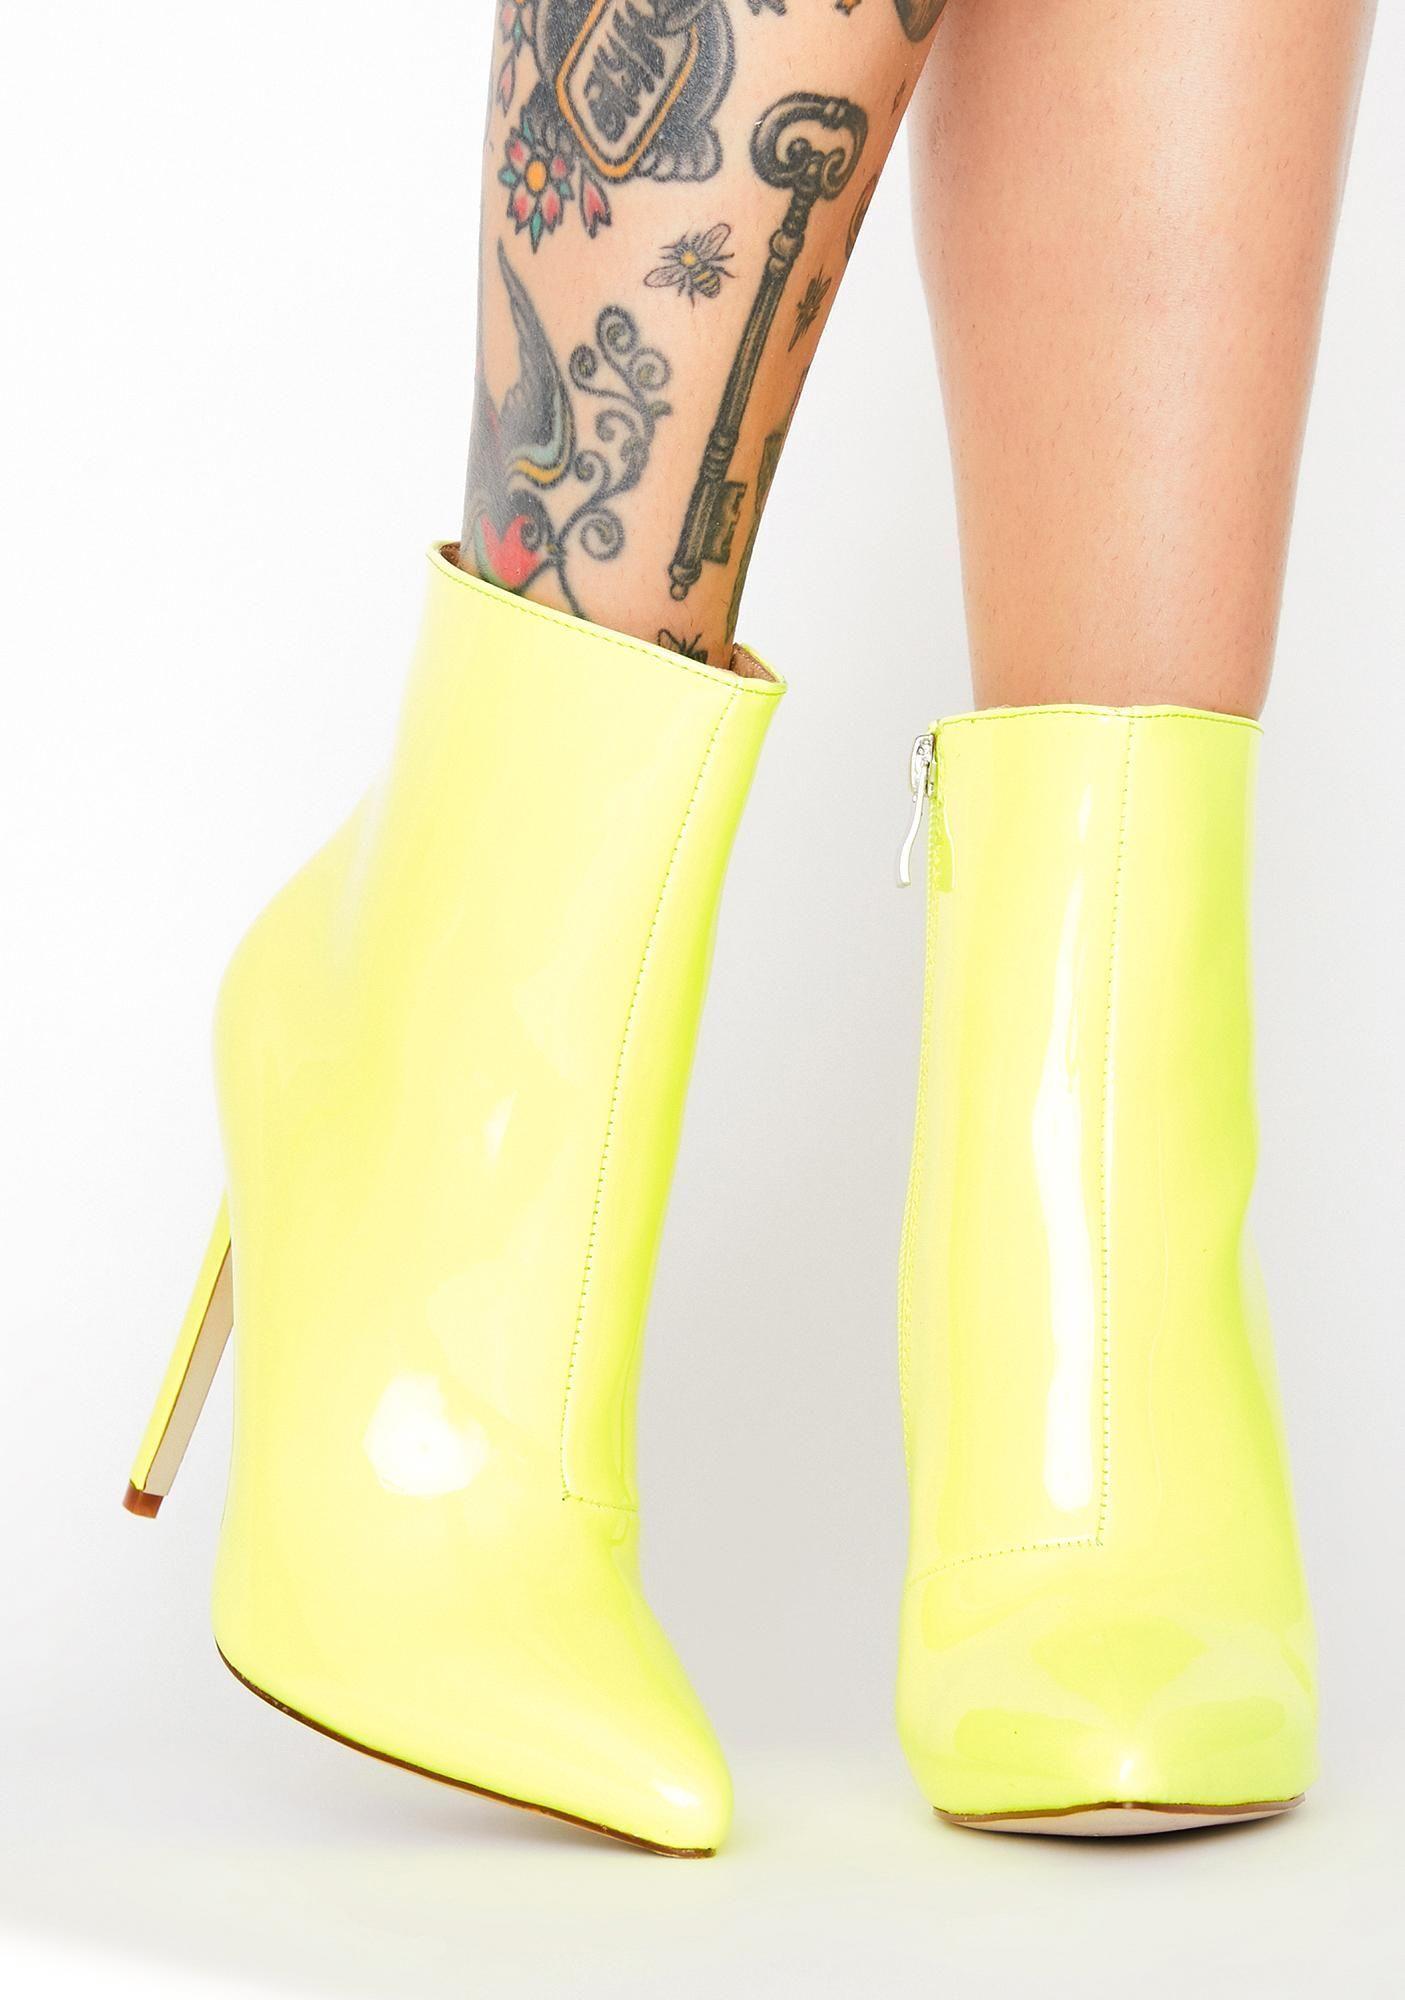 Shook Gotta Have It Ankle Boots #gottahaveit AZALEA WANG Shook Gotta Have It Ankle Boots | Dolls Kill #gottahaveit Shook Gotta Have It Ankle Boots #gottahaveit AZALEA WANG Shook Gotta Have It Ankle Boots | Dolls Kill #gottahaveit